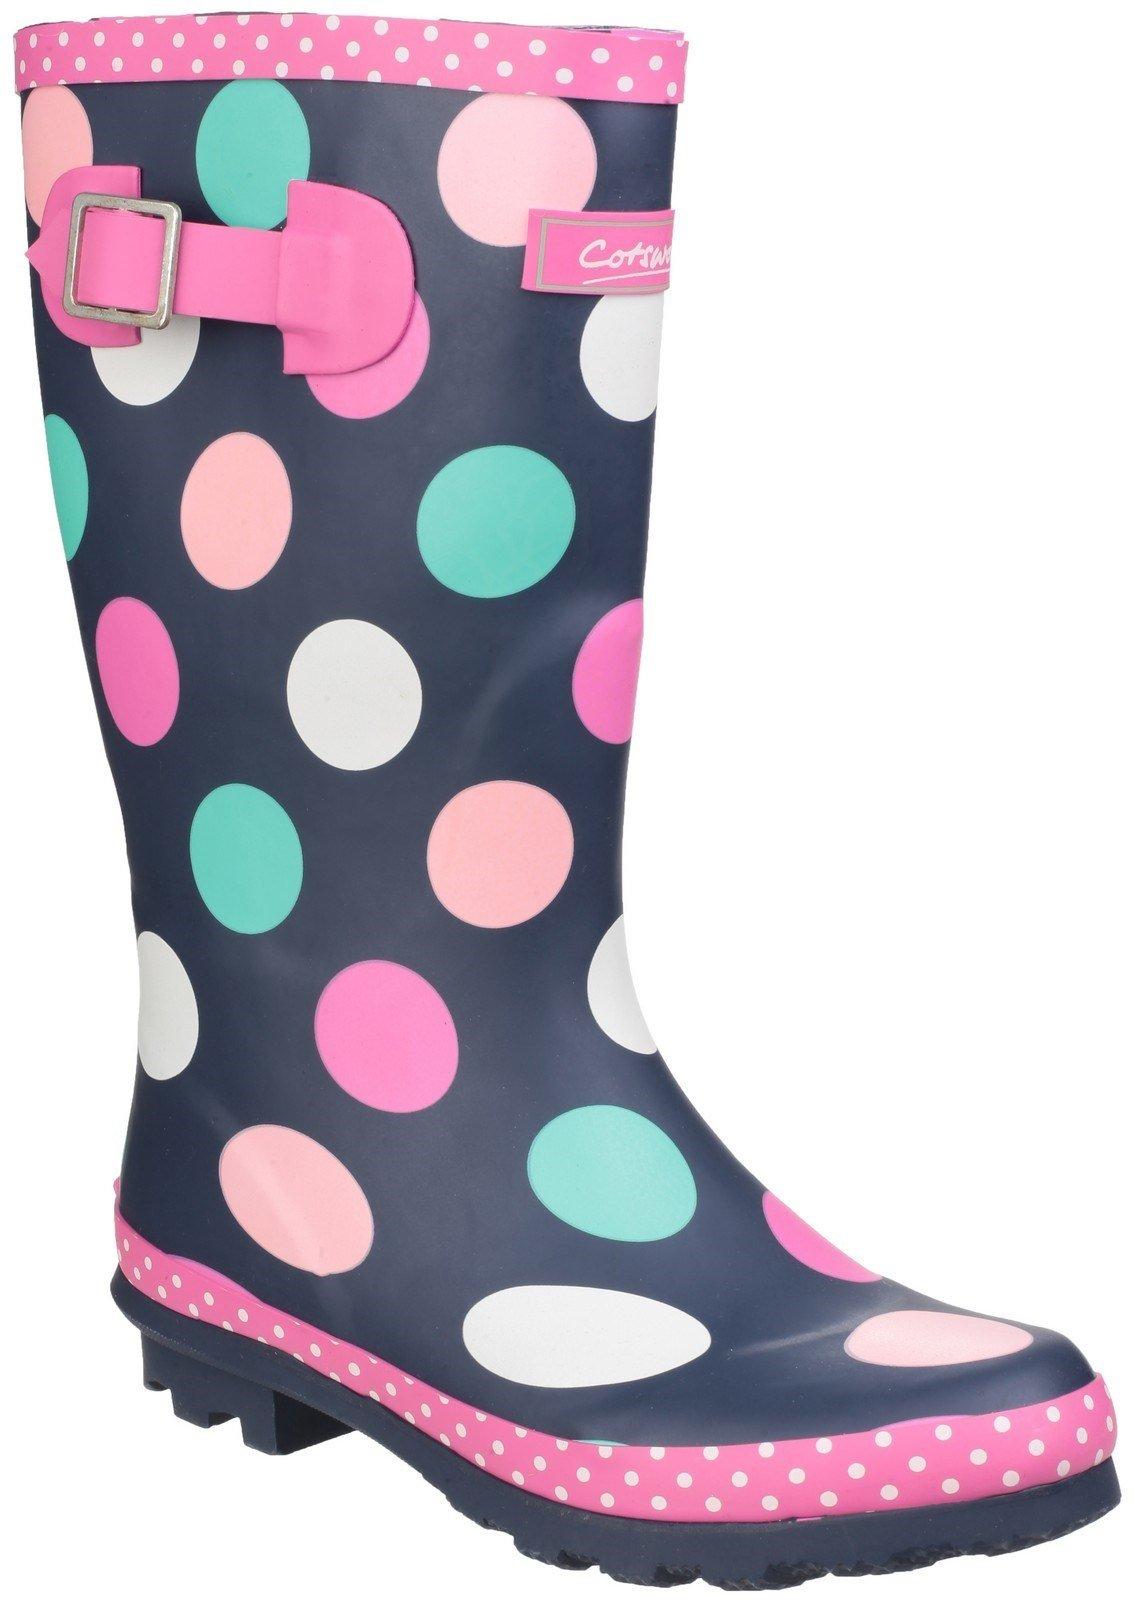 Cotswold Kids Dotty Jnr Pull On Wellington Boot Multicolor 24247 - Multicoloured 13